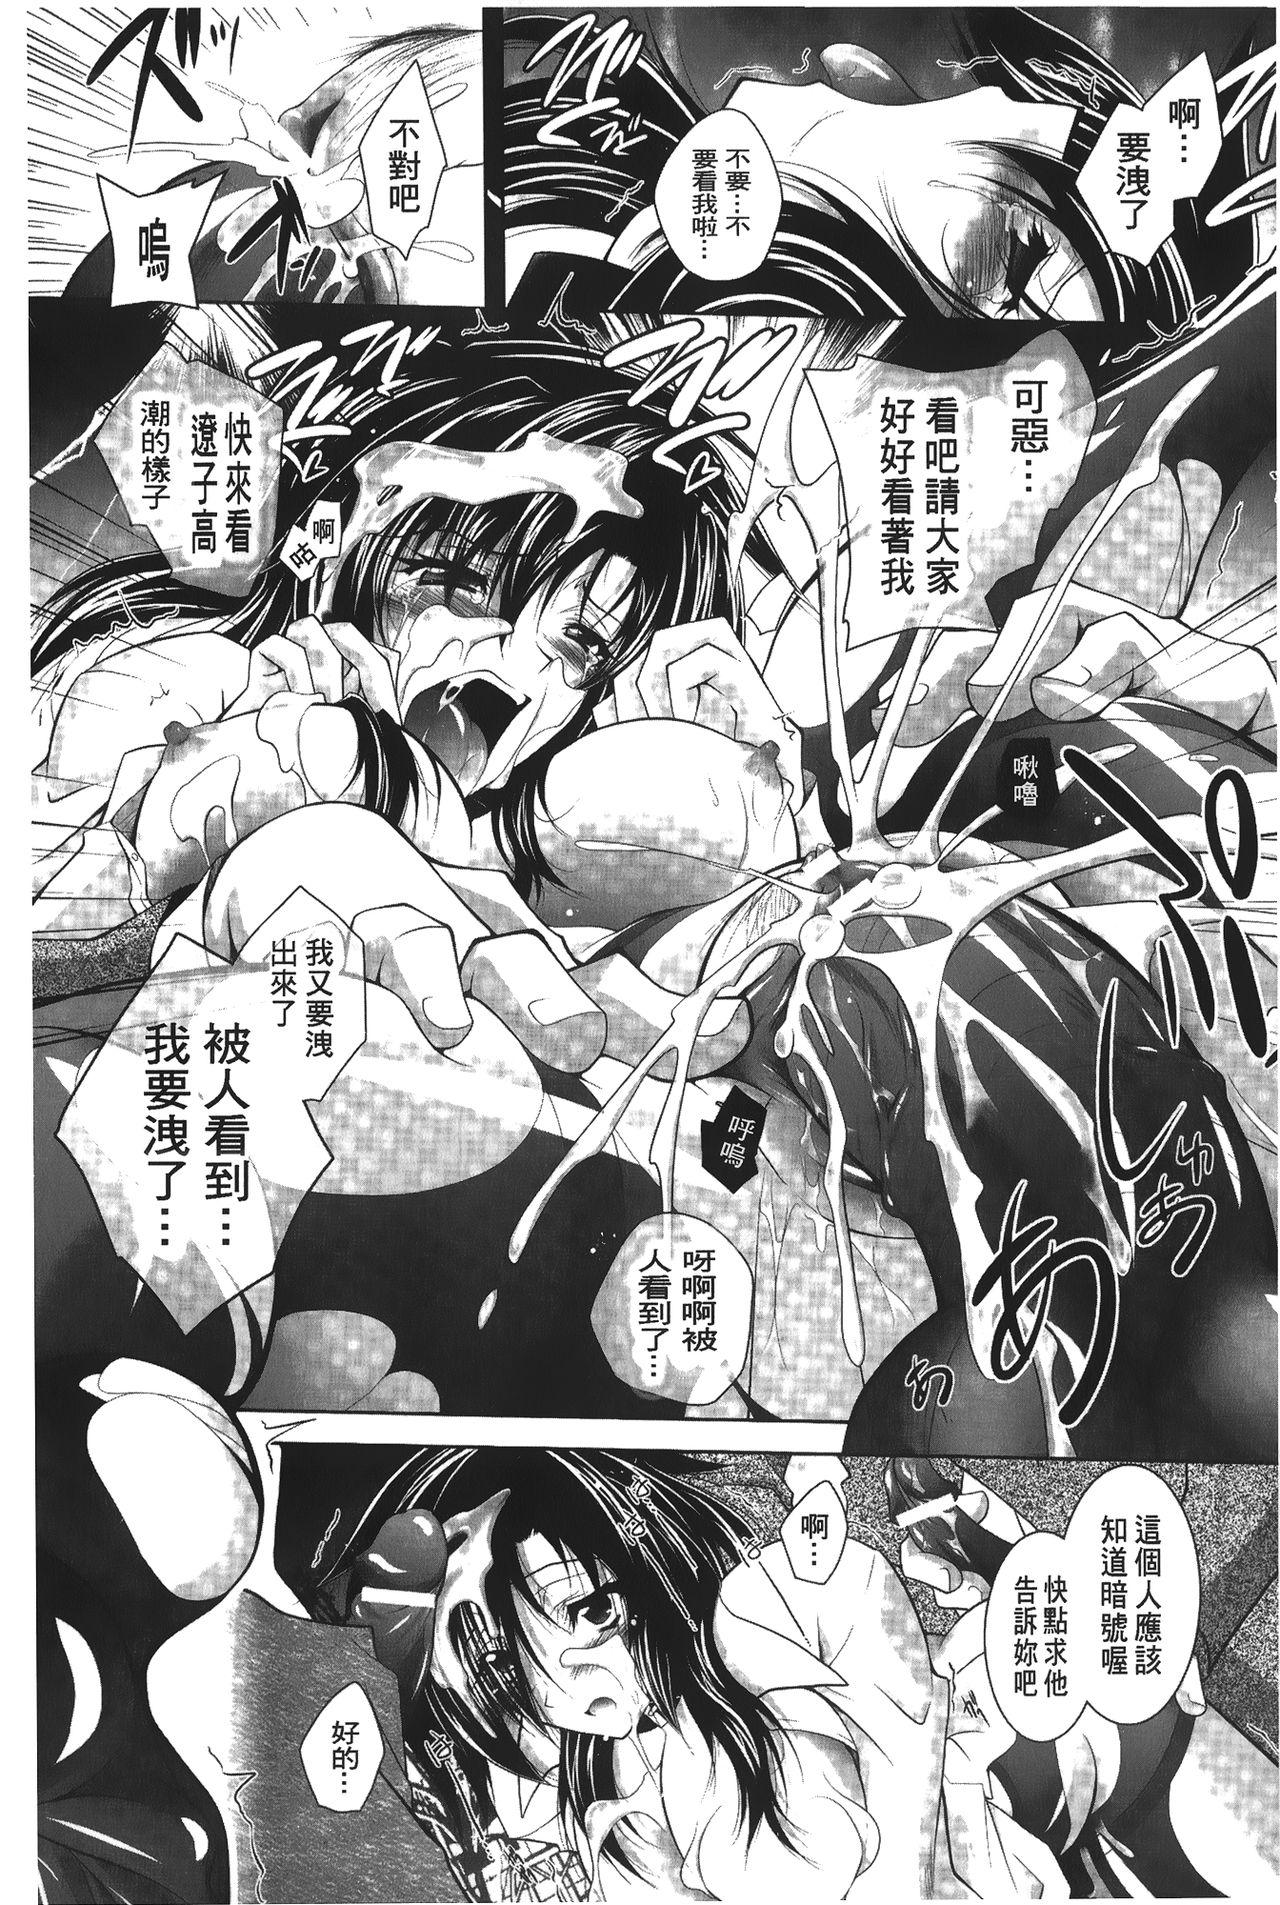 [Parfait] Datenshi-tachi no Rondo - Fallen Angels Rondo   墮天使們的圓舞曲 [Chinese] 62